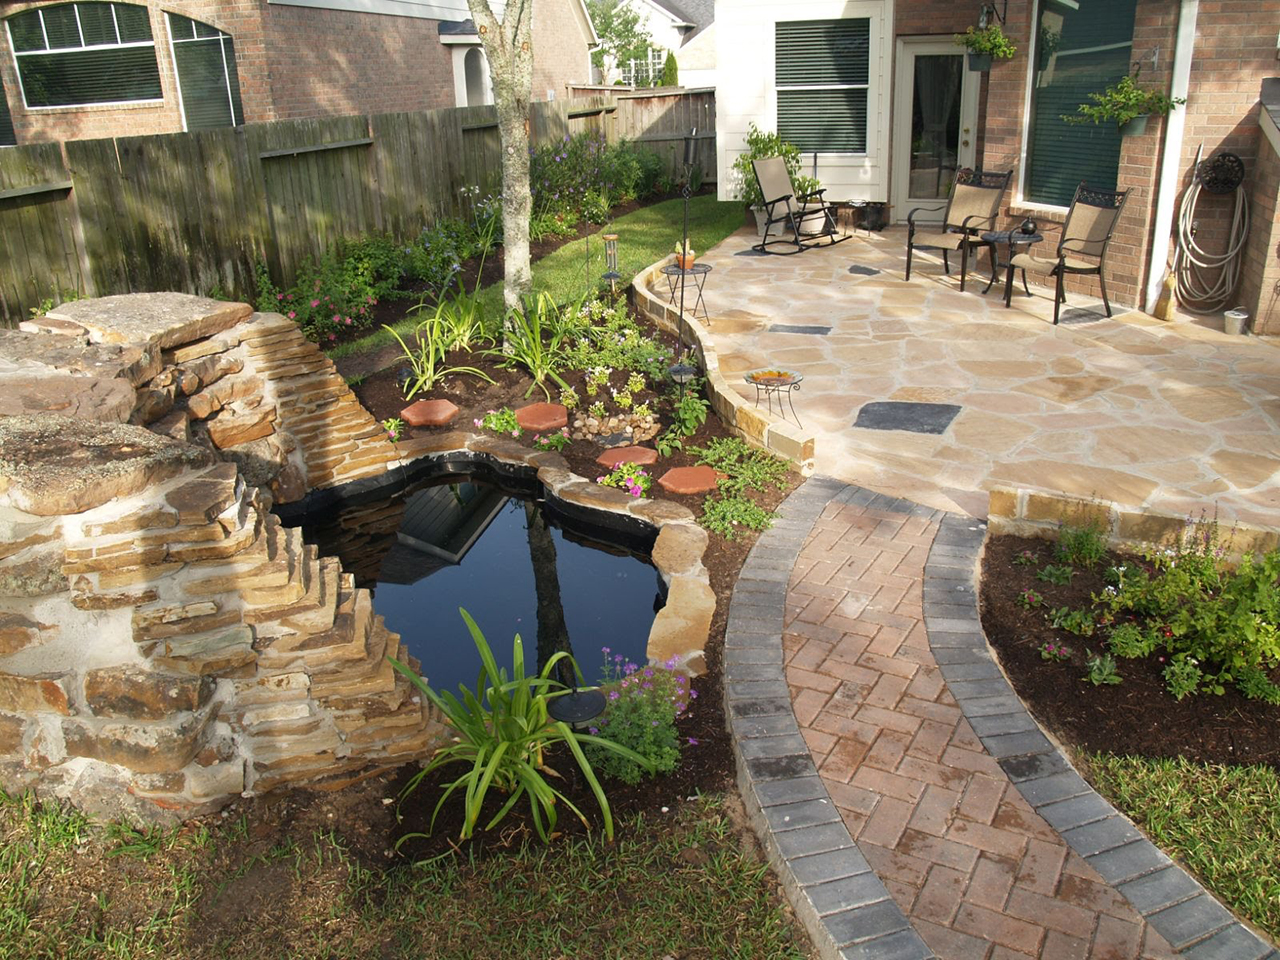 Peculiar 47 Backyard Ideas Backyard Oasis Homebnc Backyard Oasis Ideas On A Budget Backyard Oasis Ideas Pergola outdoor Backyard Oasis Ideas